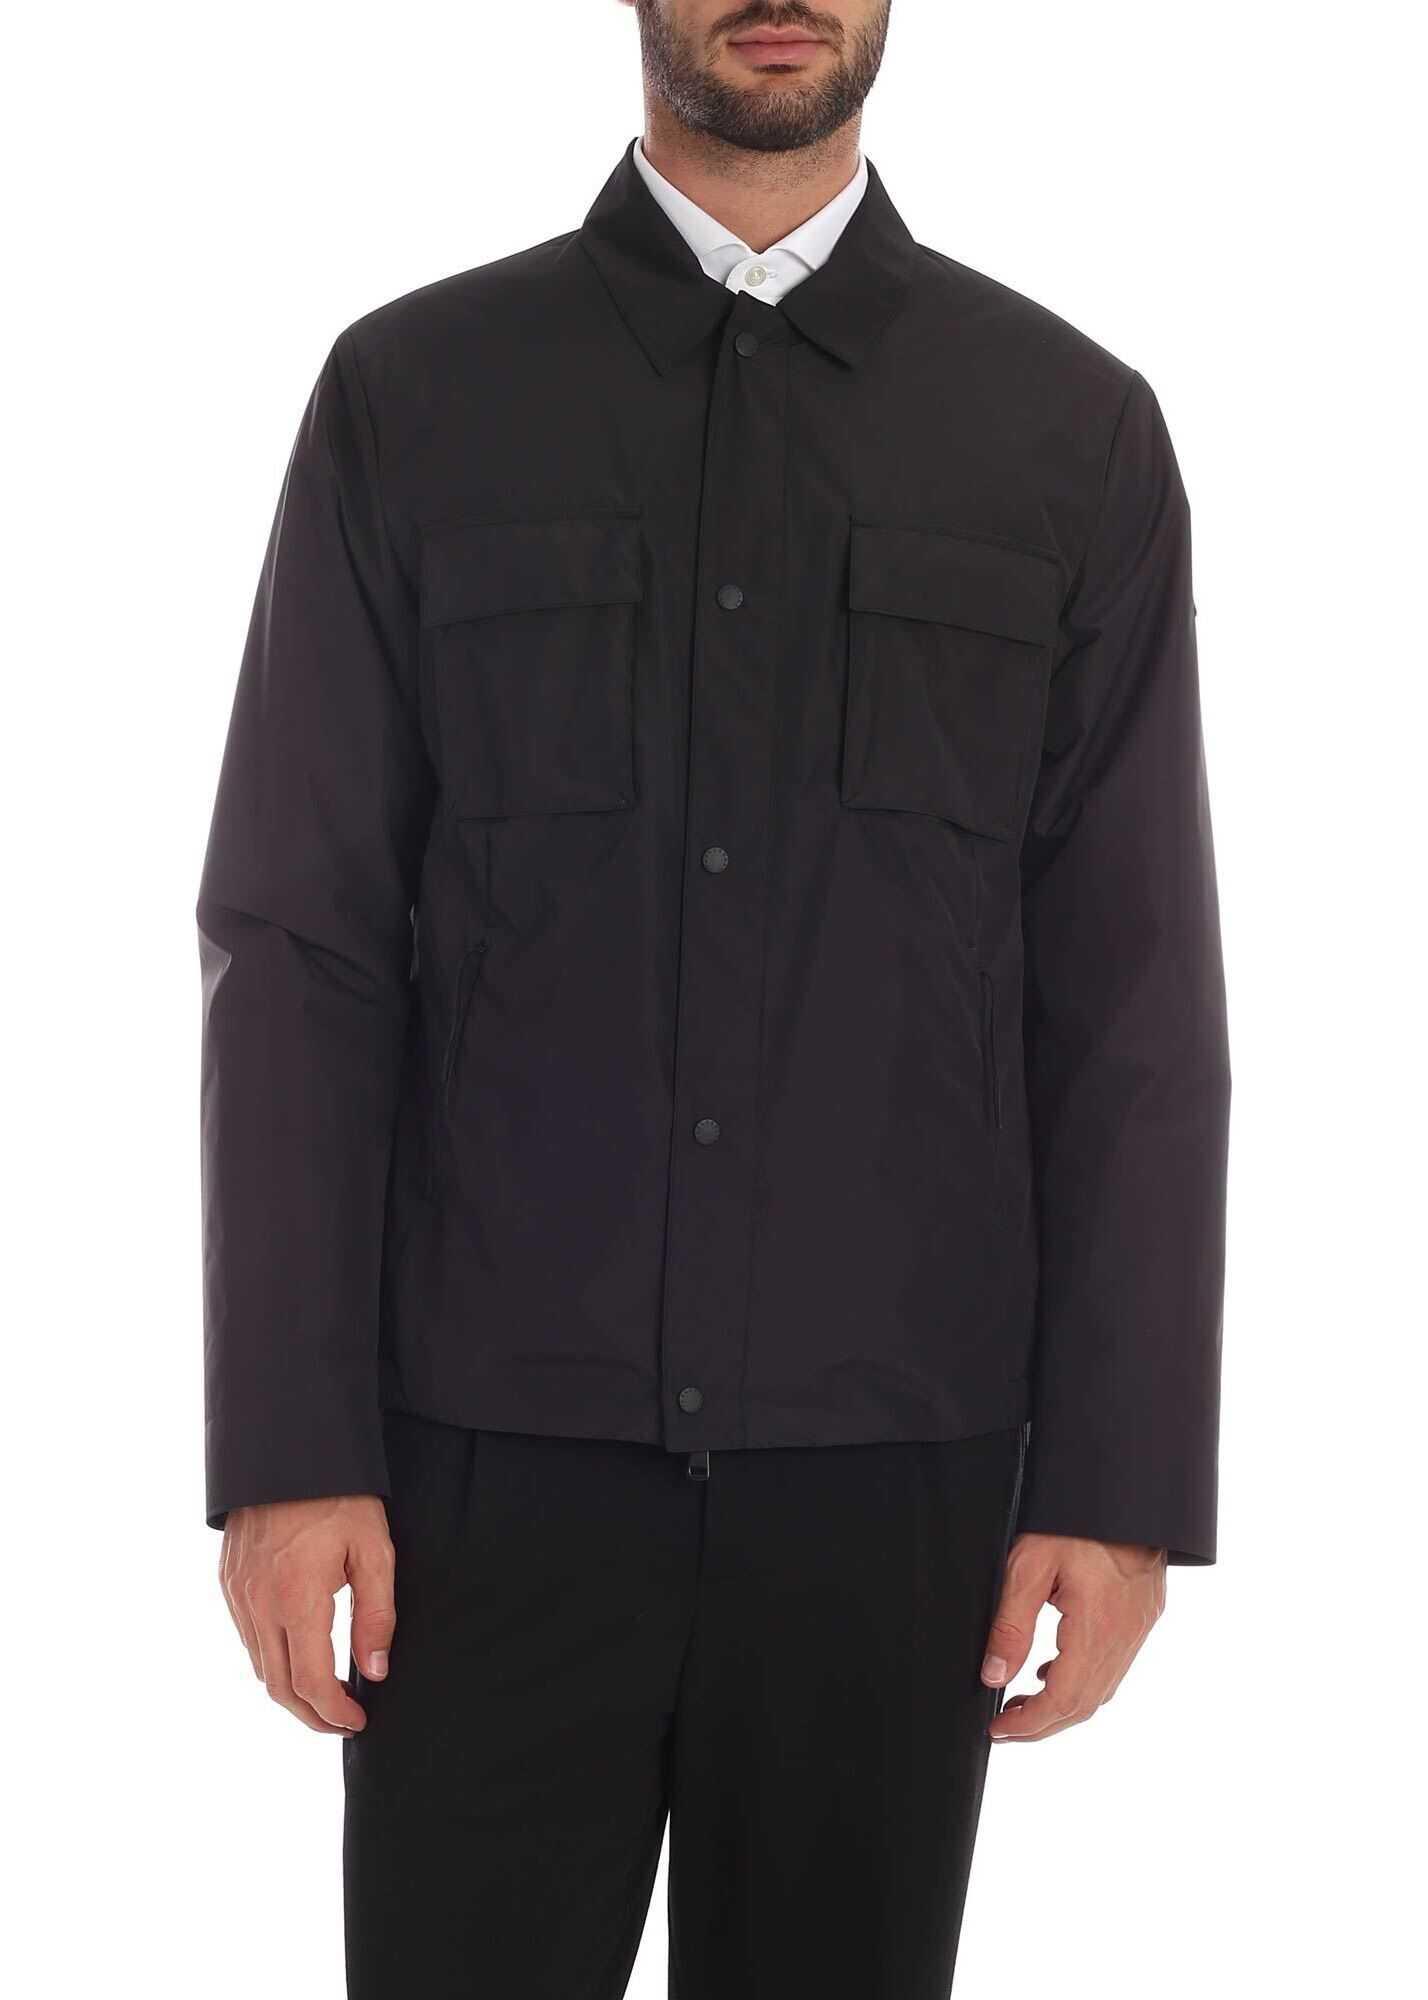 Paul&Shark Technical Fabric Jacket In Black Black